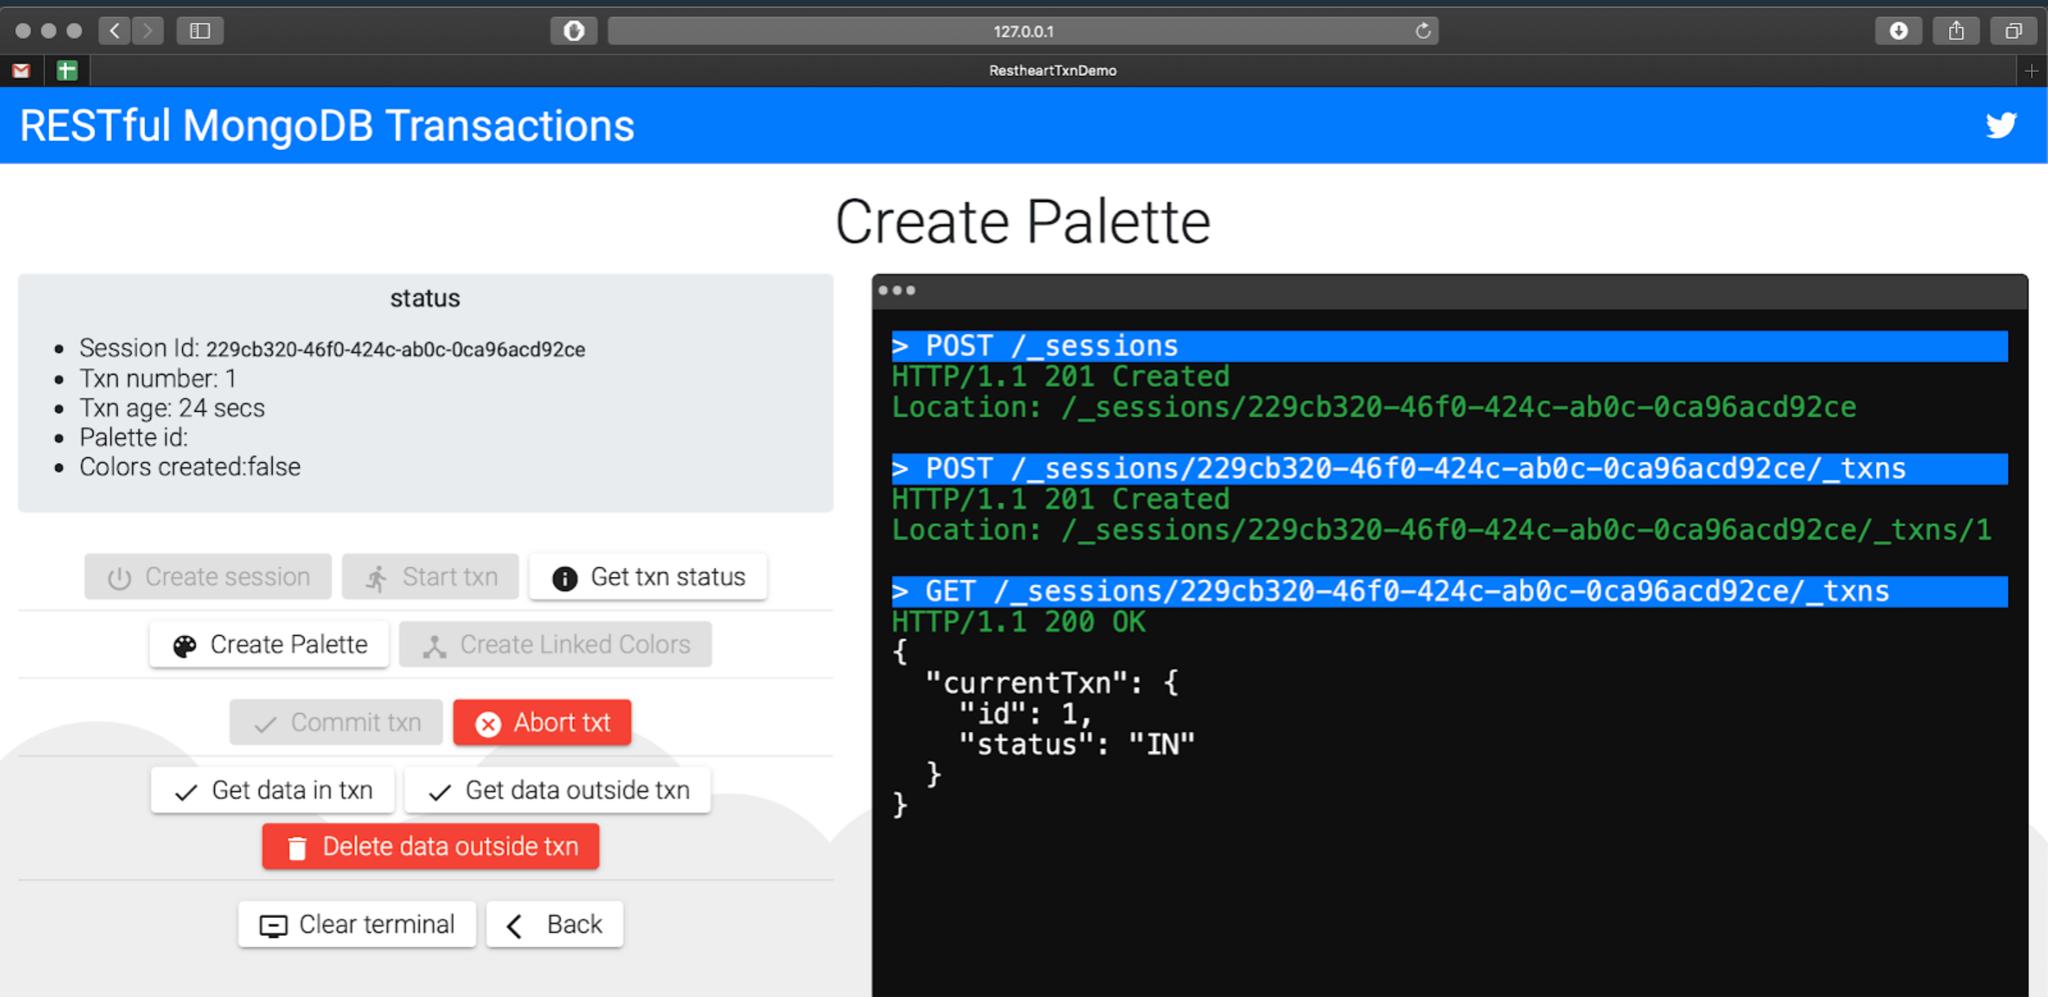 Figure 2 - User screen view in RESTHeart.